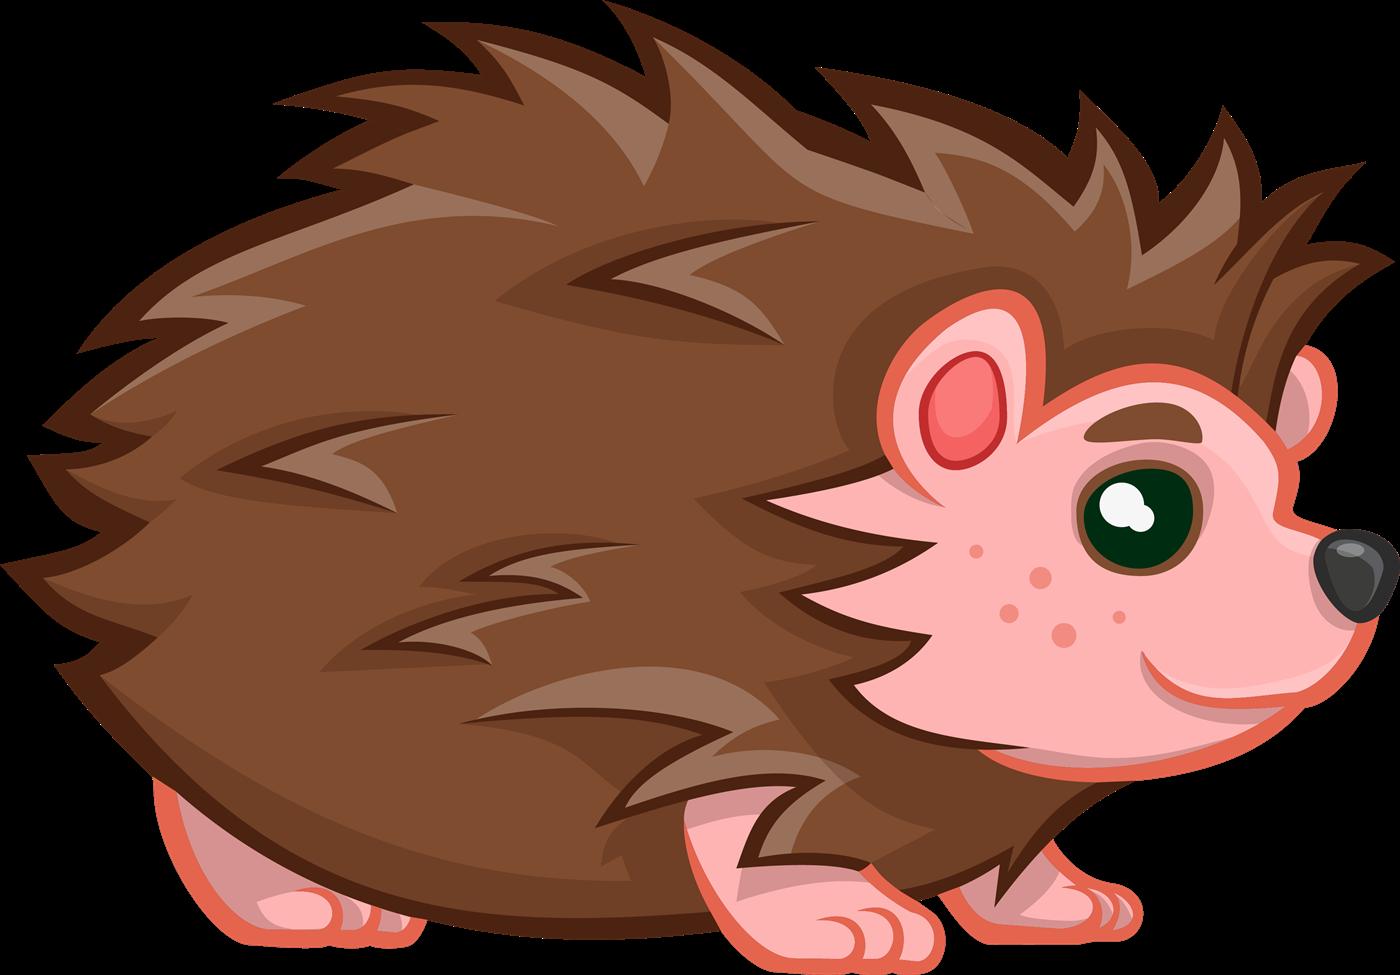 collection of cute. Hedgehog clipart kawaii